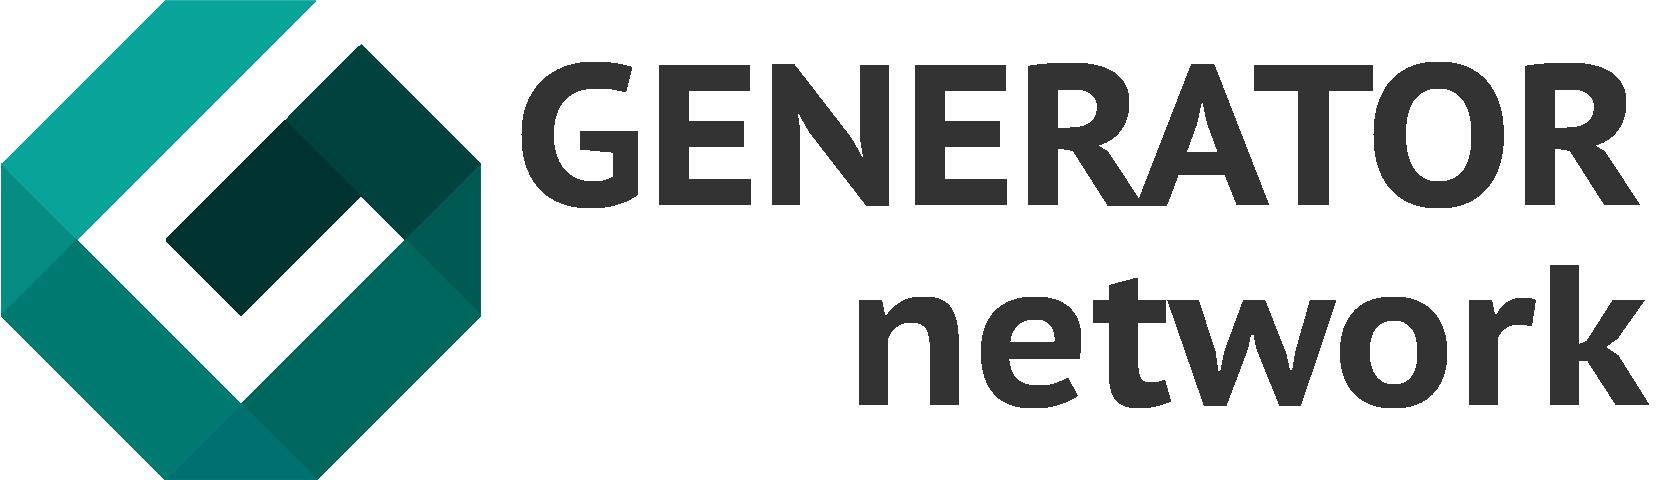 LOGO generator network.png